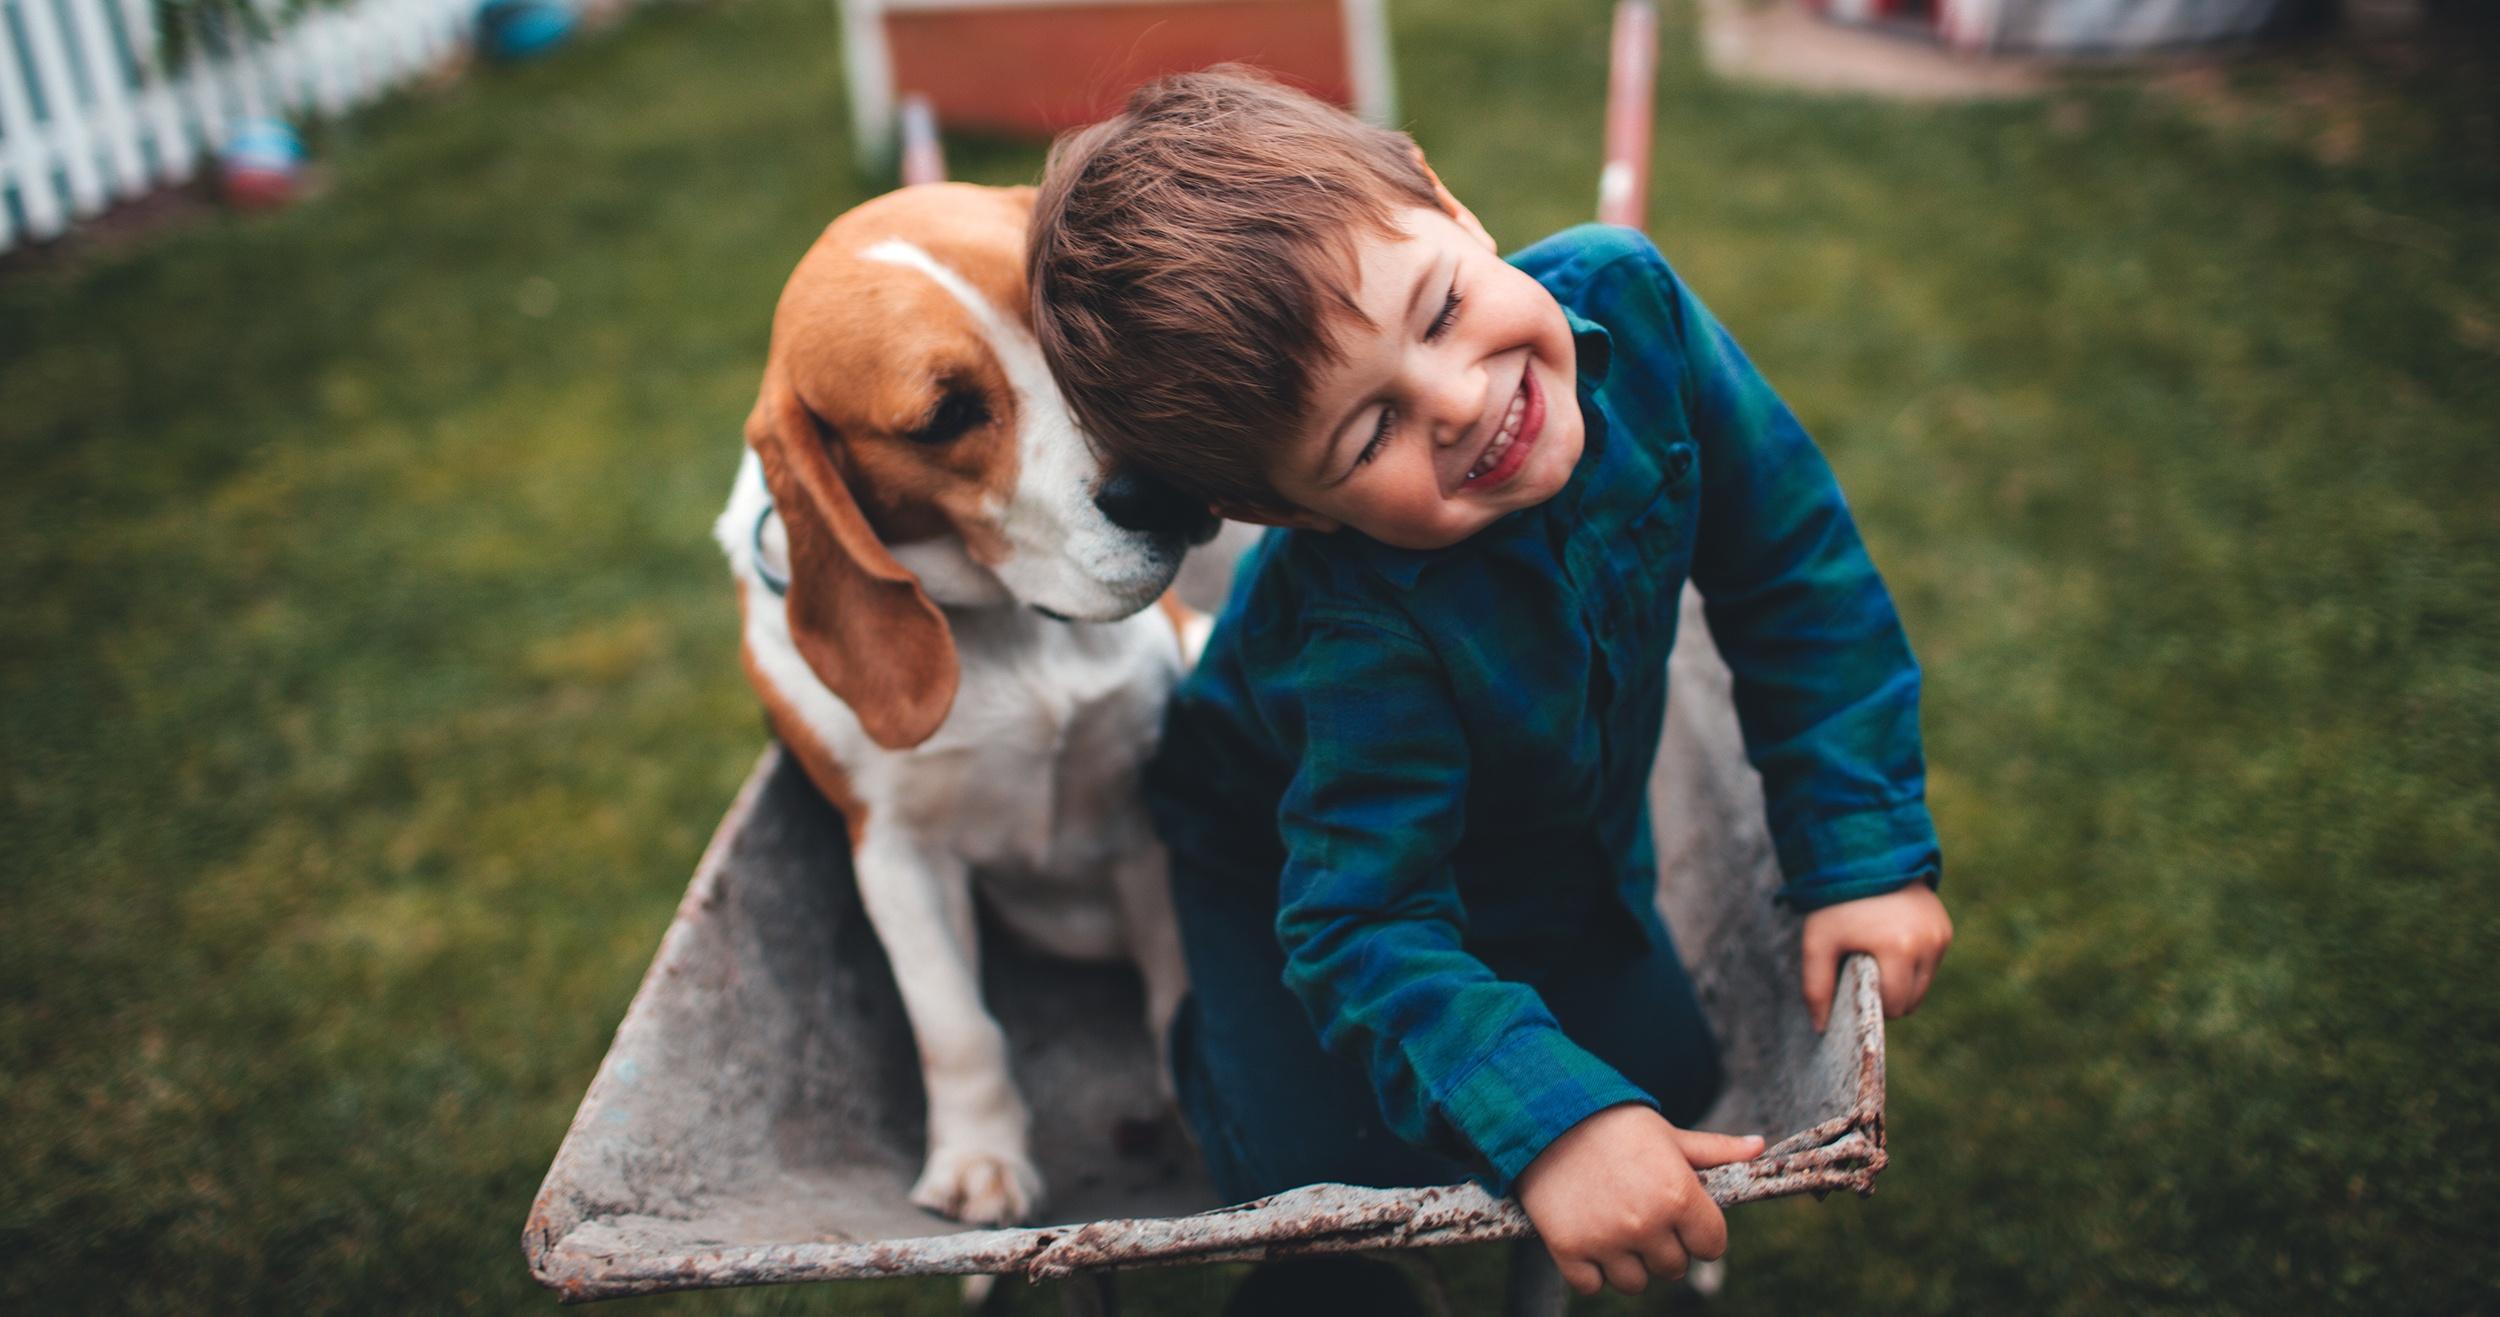 homepage-boy-dog.jpg